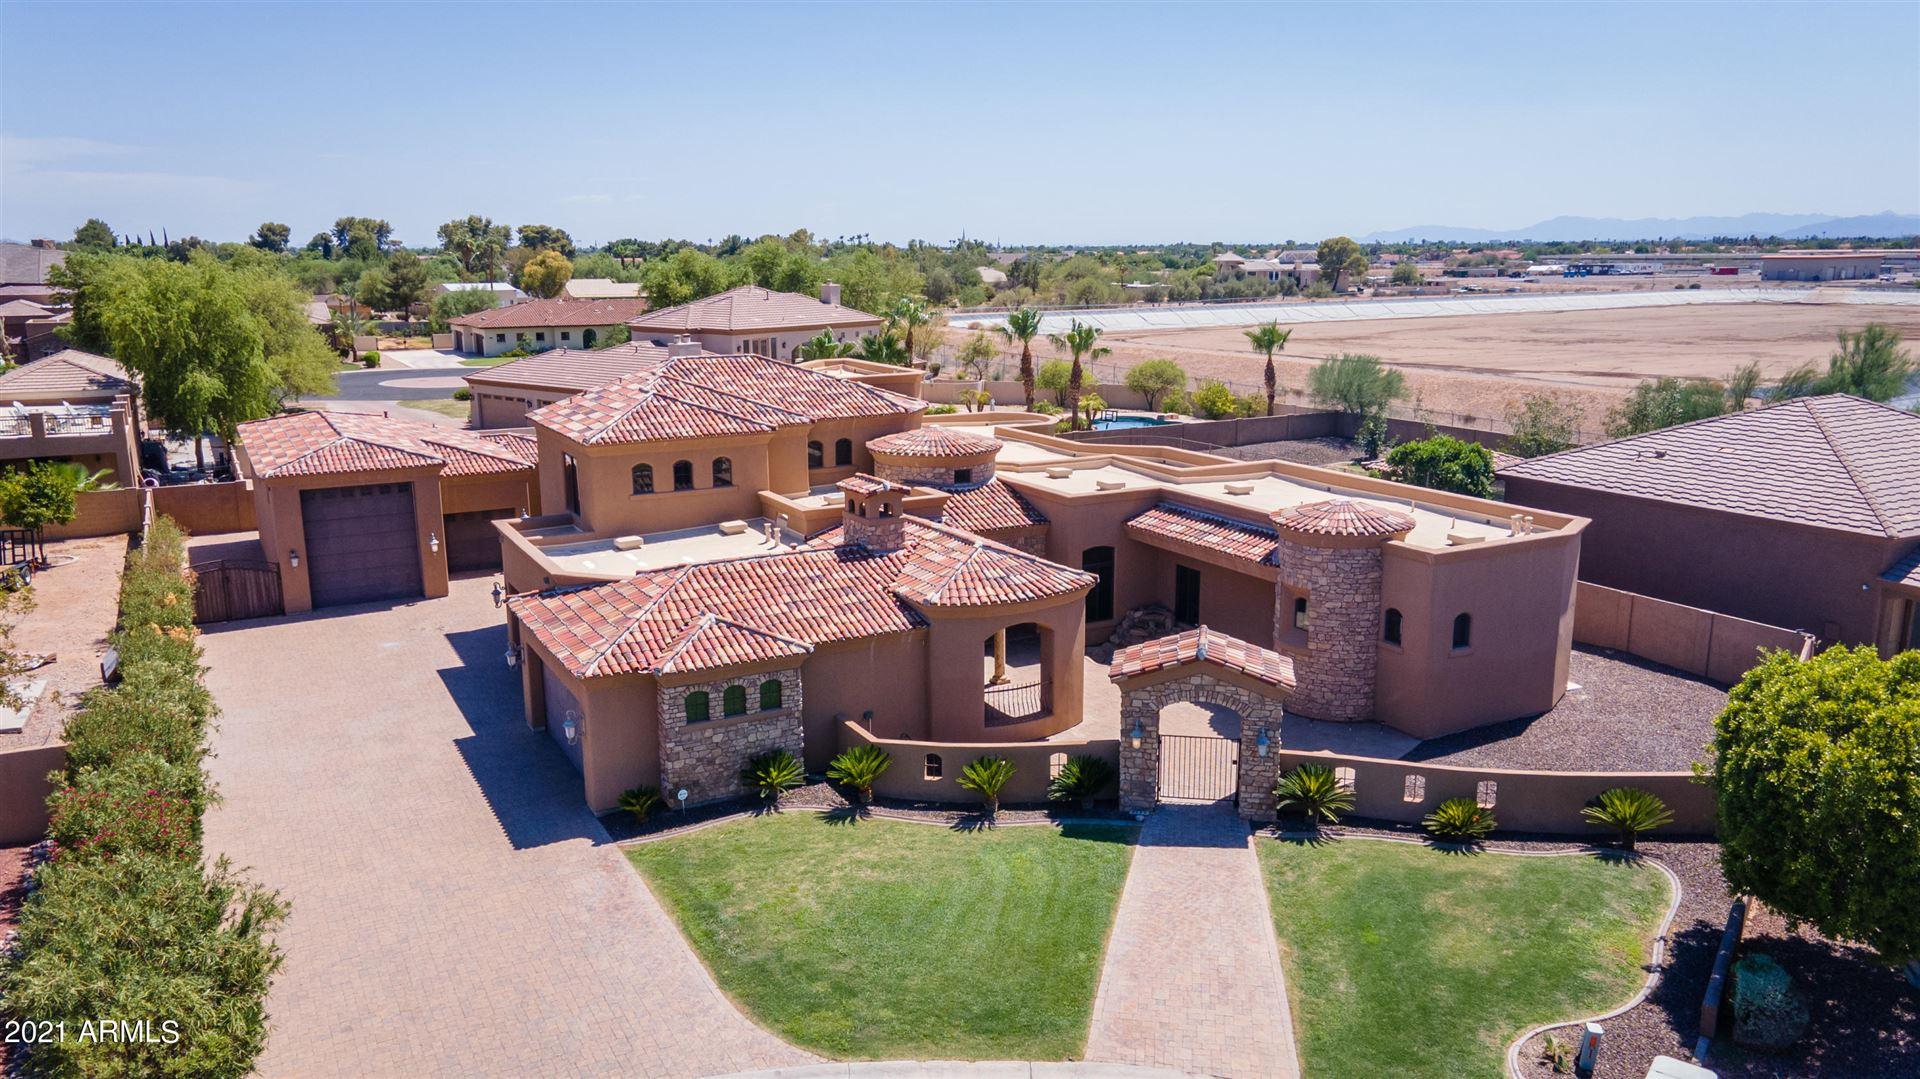 Photo of 3525 E POMEGRANATE Circle, Mesa, AZ 85213 (MLS # 6269092)